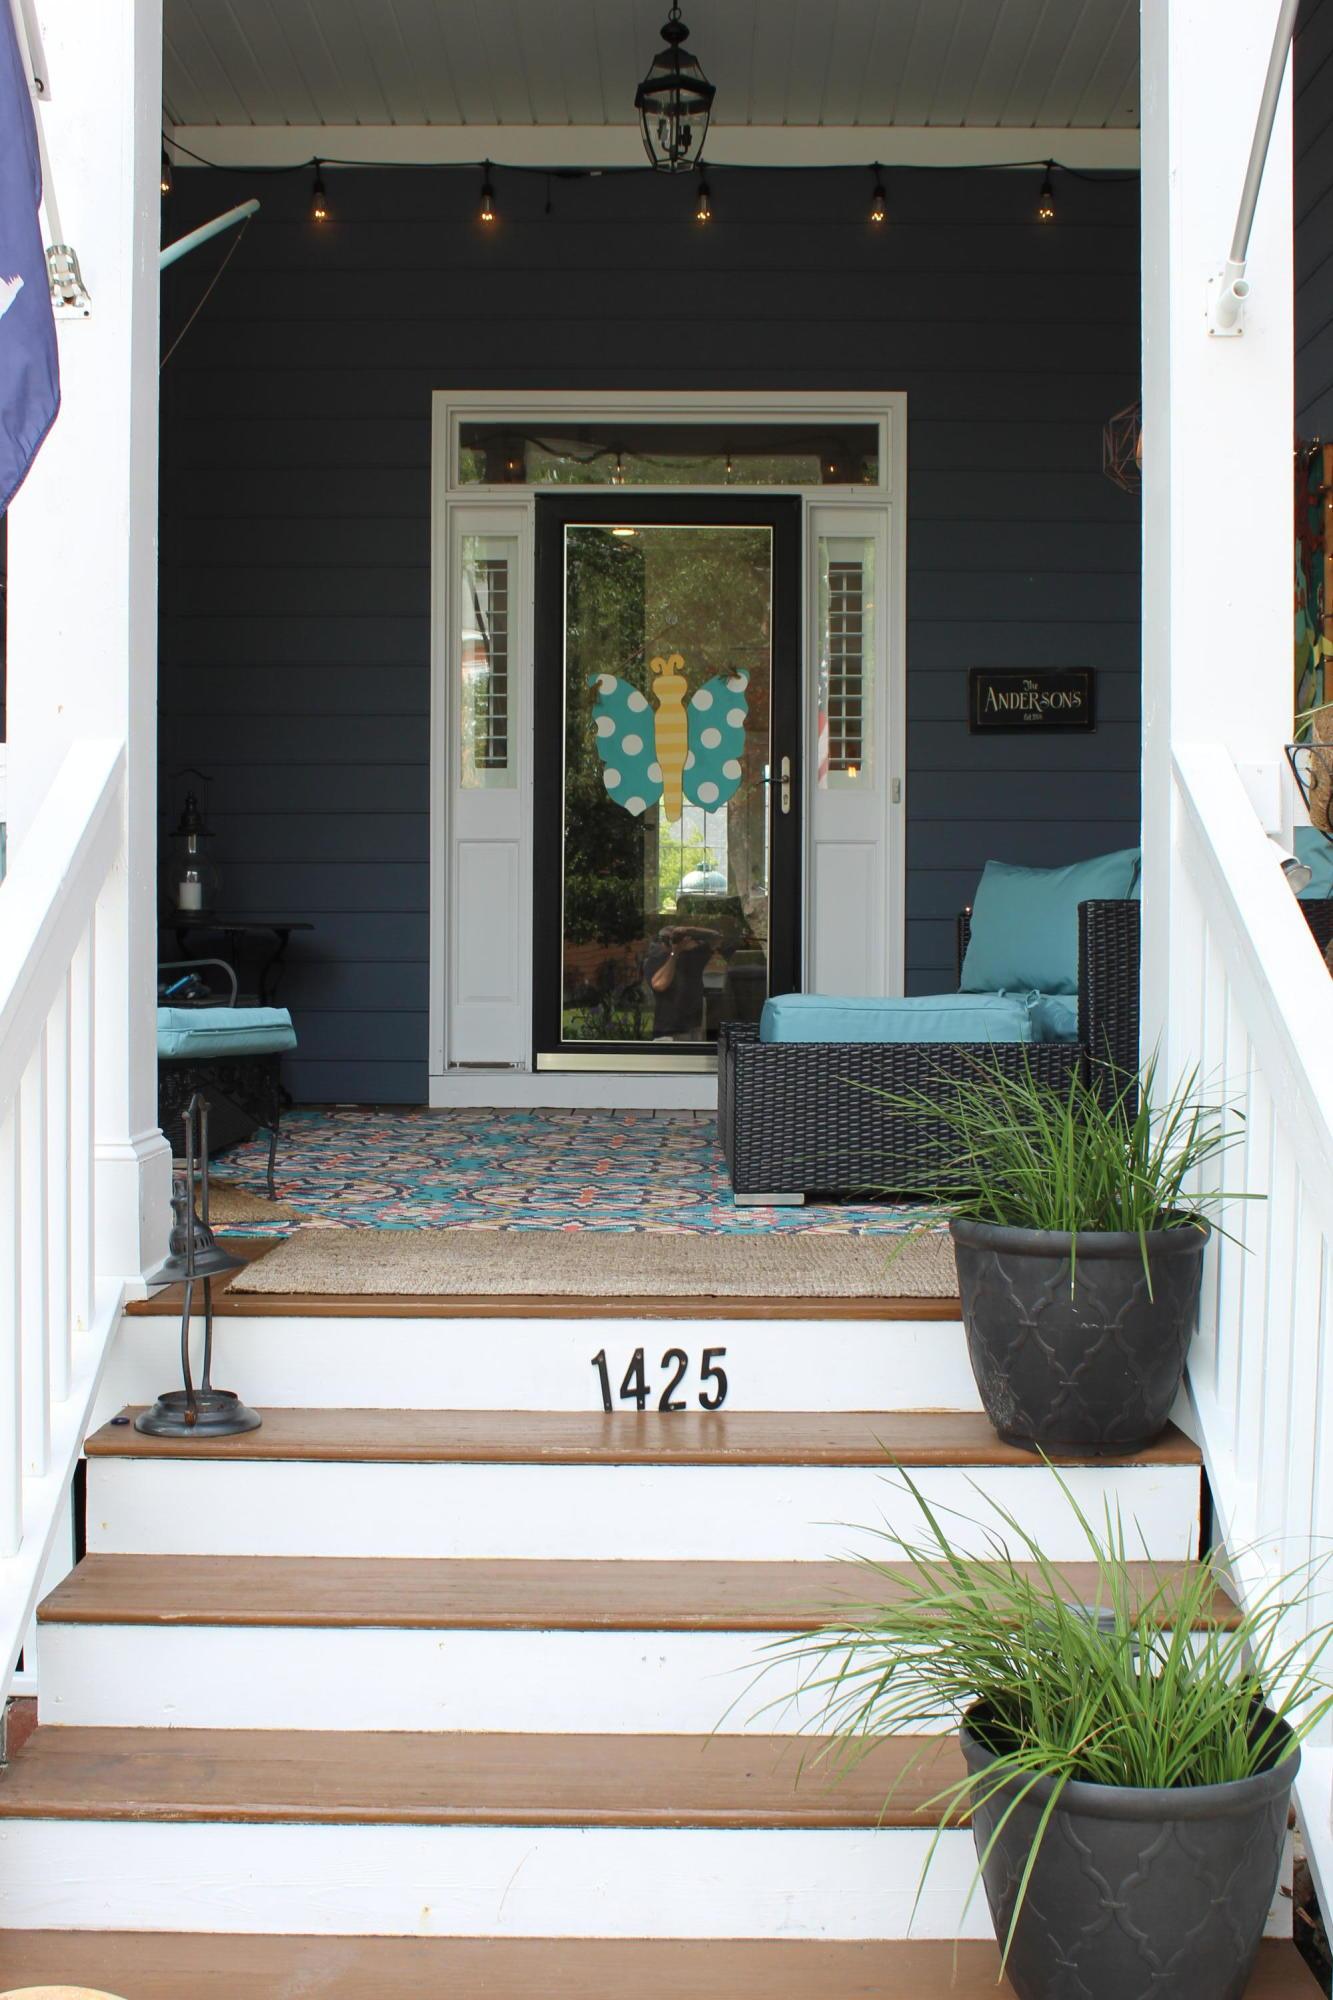 Park West Homes For Sale - 1425 Bloomingdale, Mount Pleasant, SC - 2